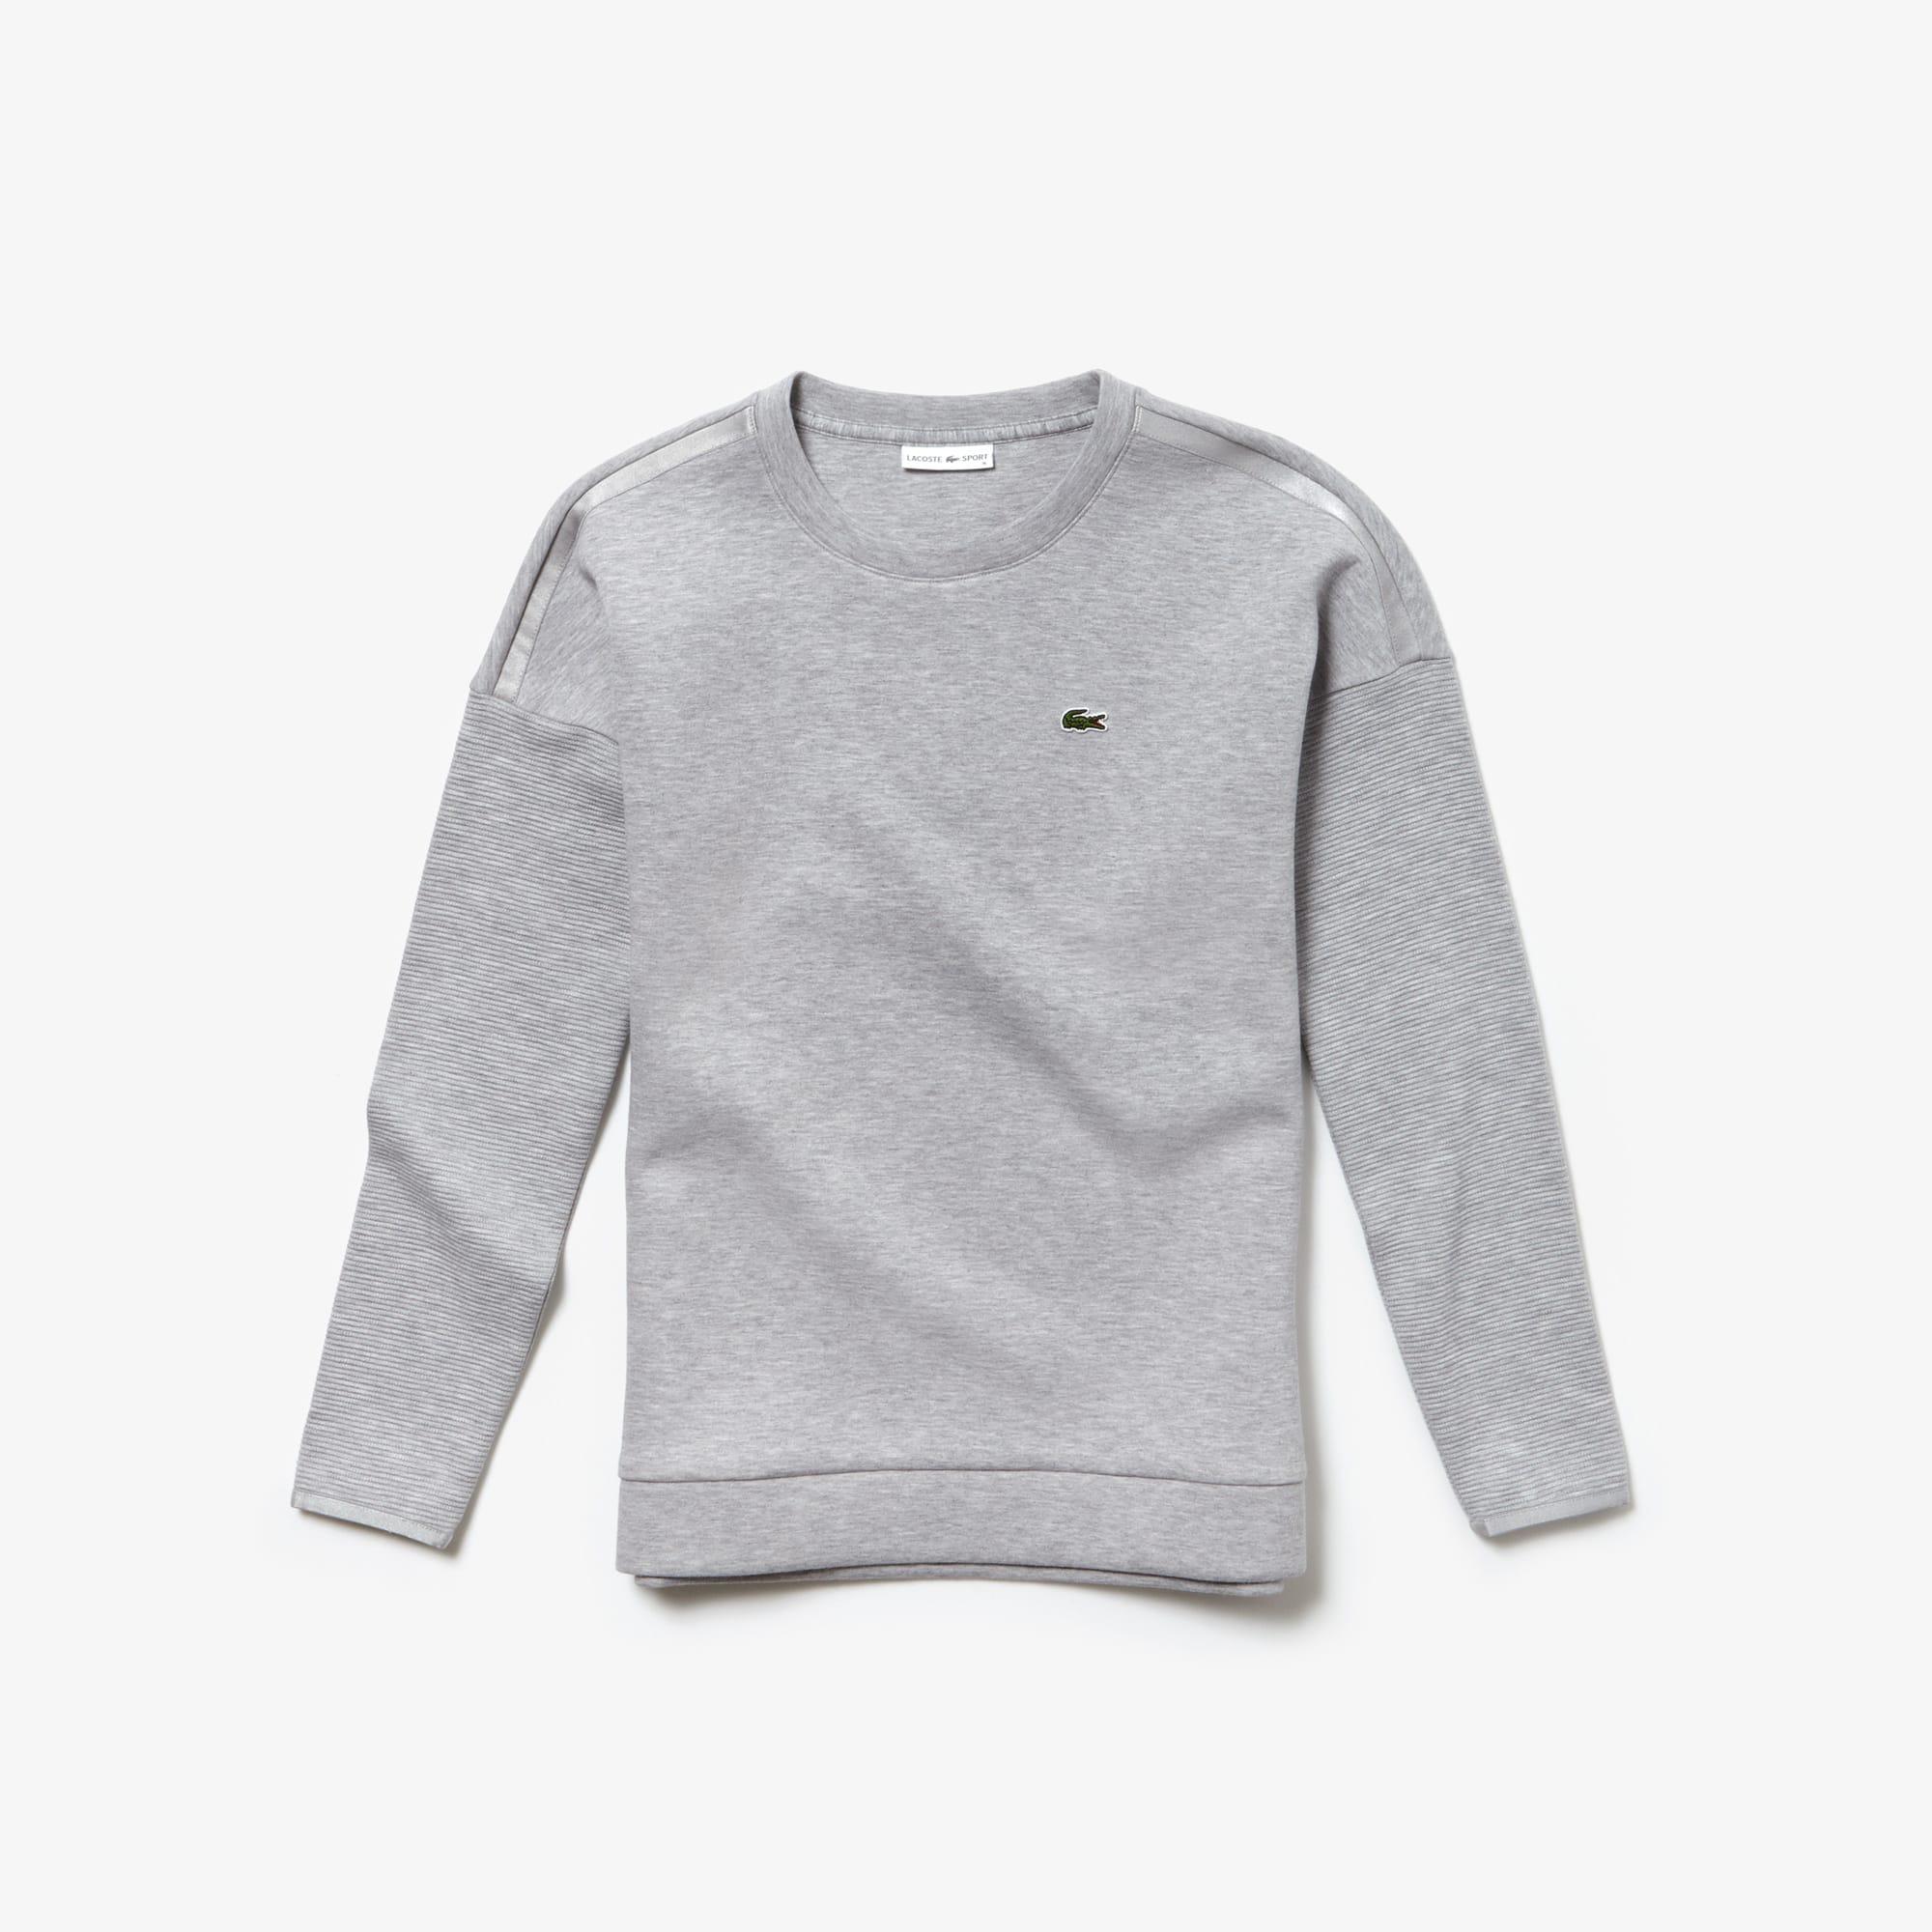 Damen LACOSTE SPORT meliertes Fleece-Sweatshirt mit Colourblocks